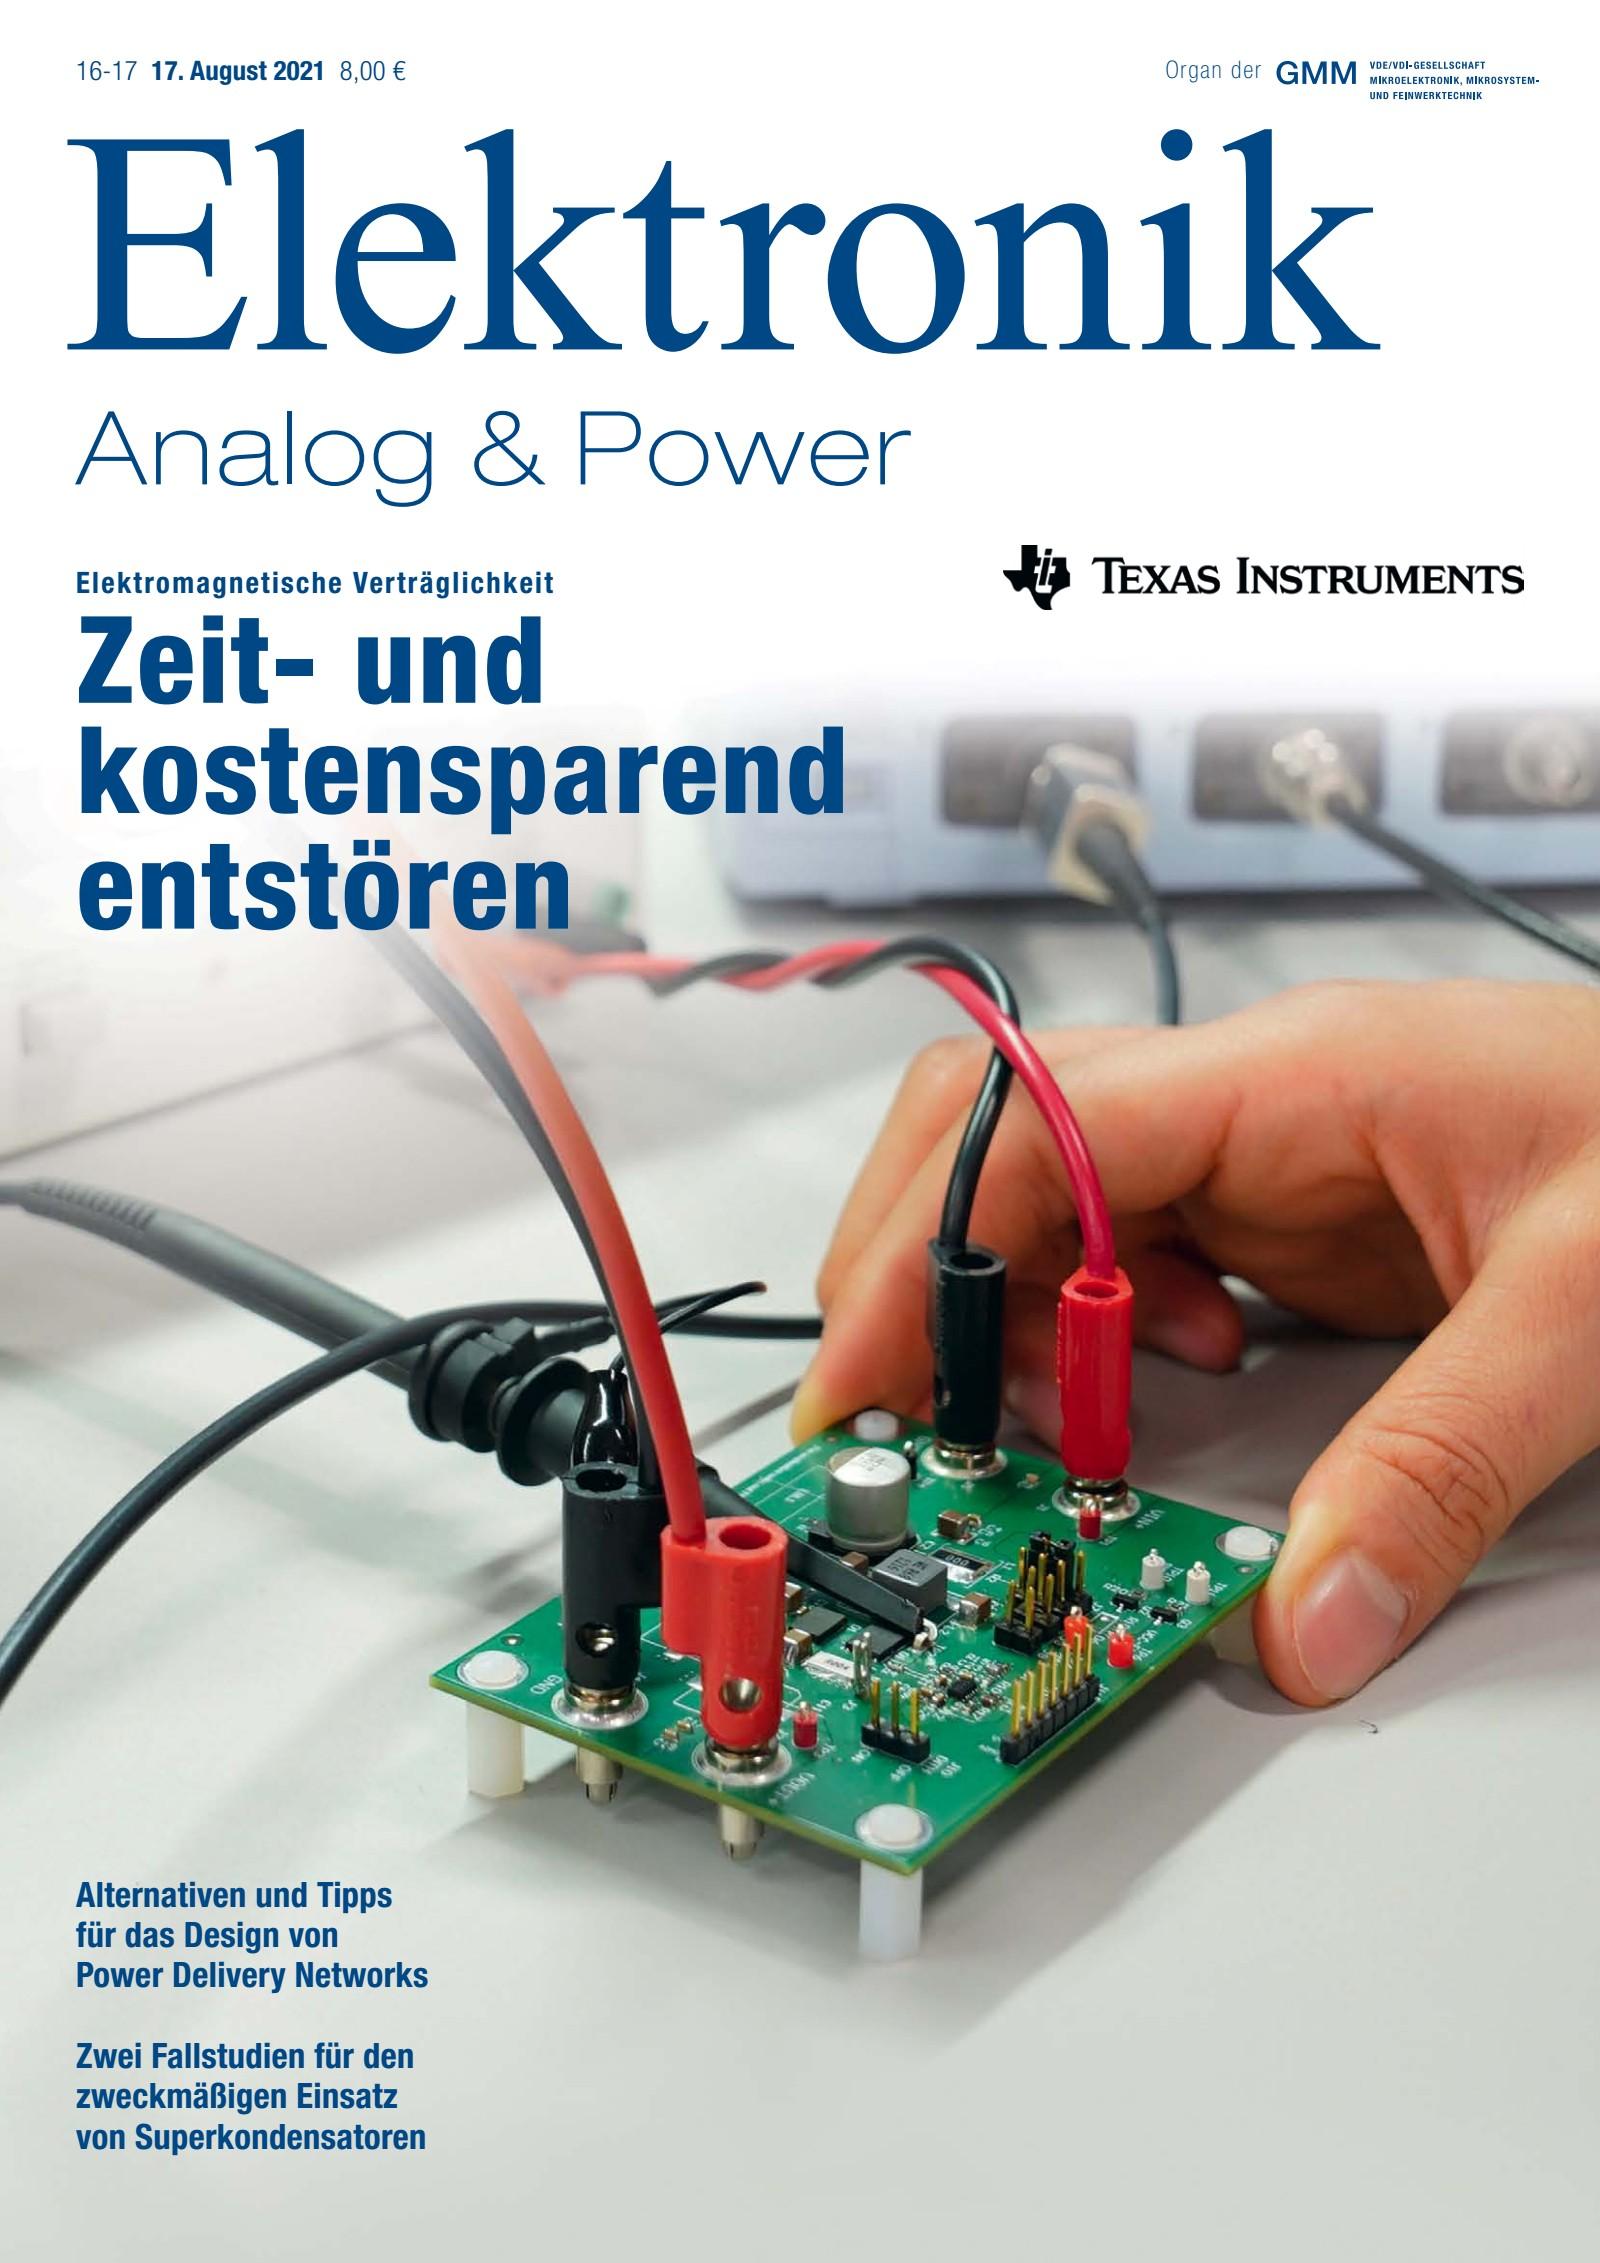 Elektronik 16-17/2021 Digital